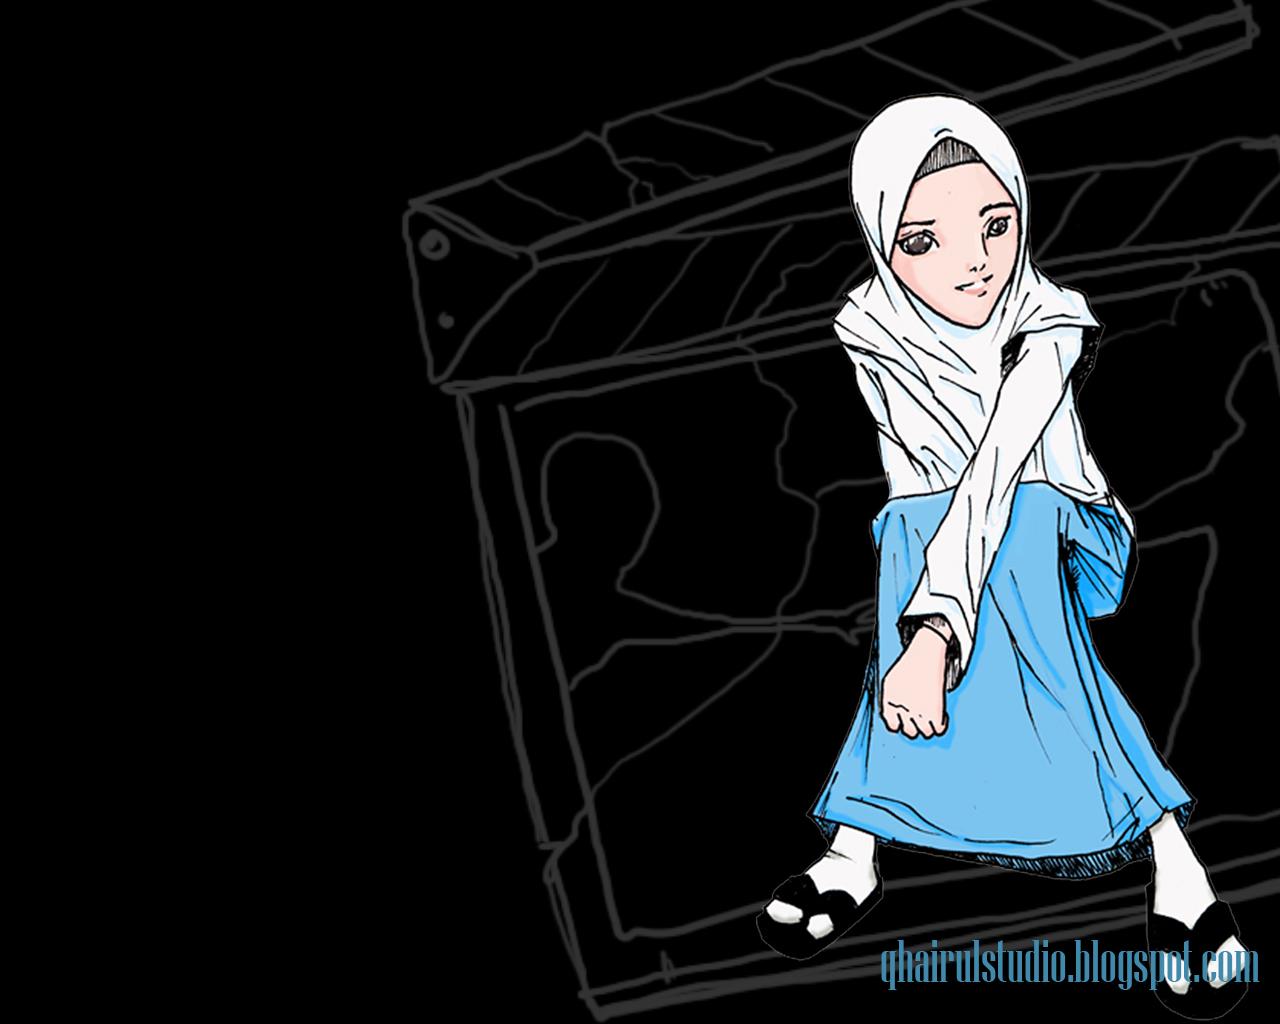 http://1.bp.blogspot.com/_xd5jxhKDAG8/TQWklhLrkGI/AAAAAAAAAI8/yqAXrpKJ5Oo/s1600/muslimah%2B2.jpg